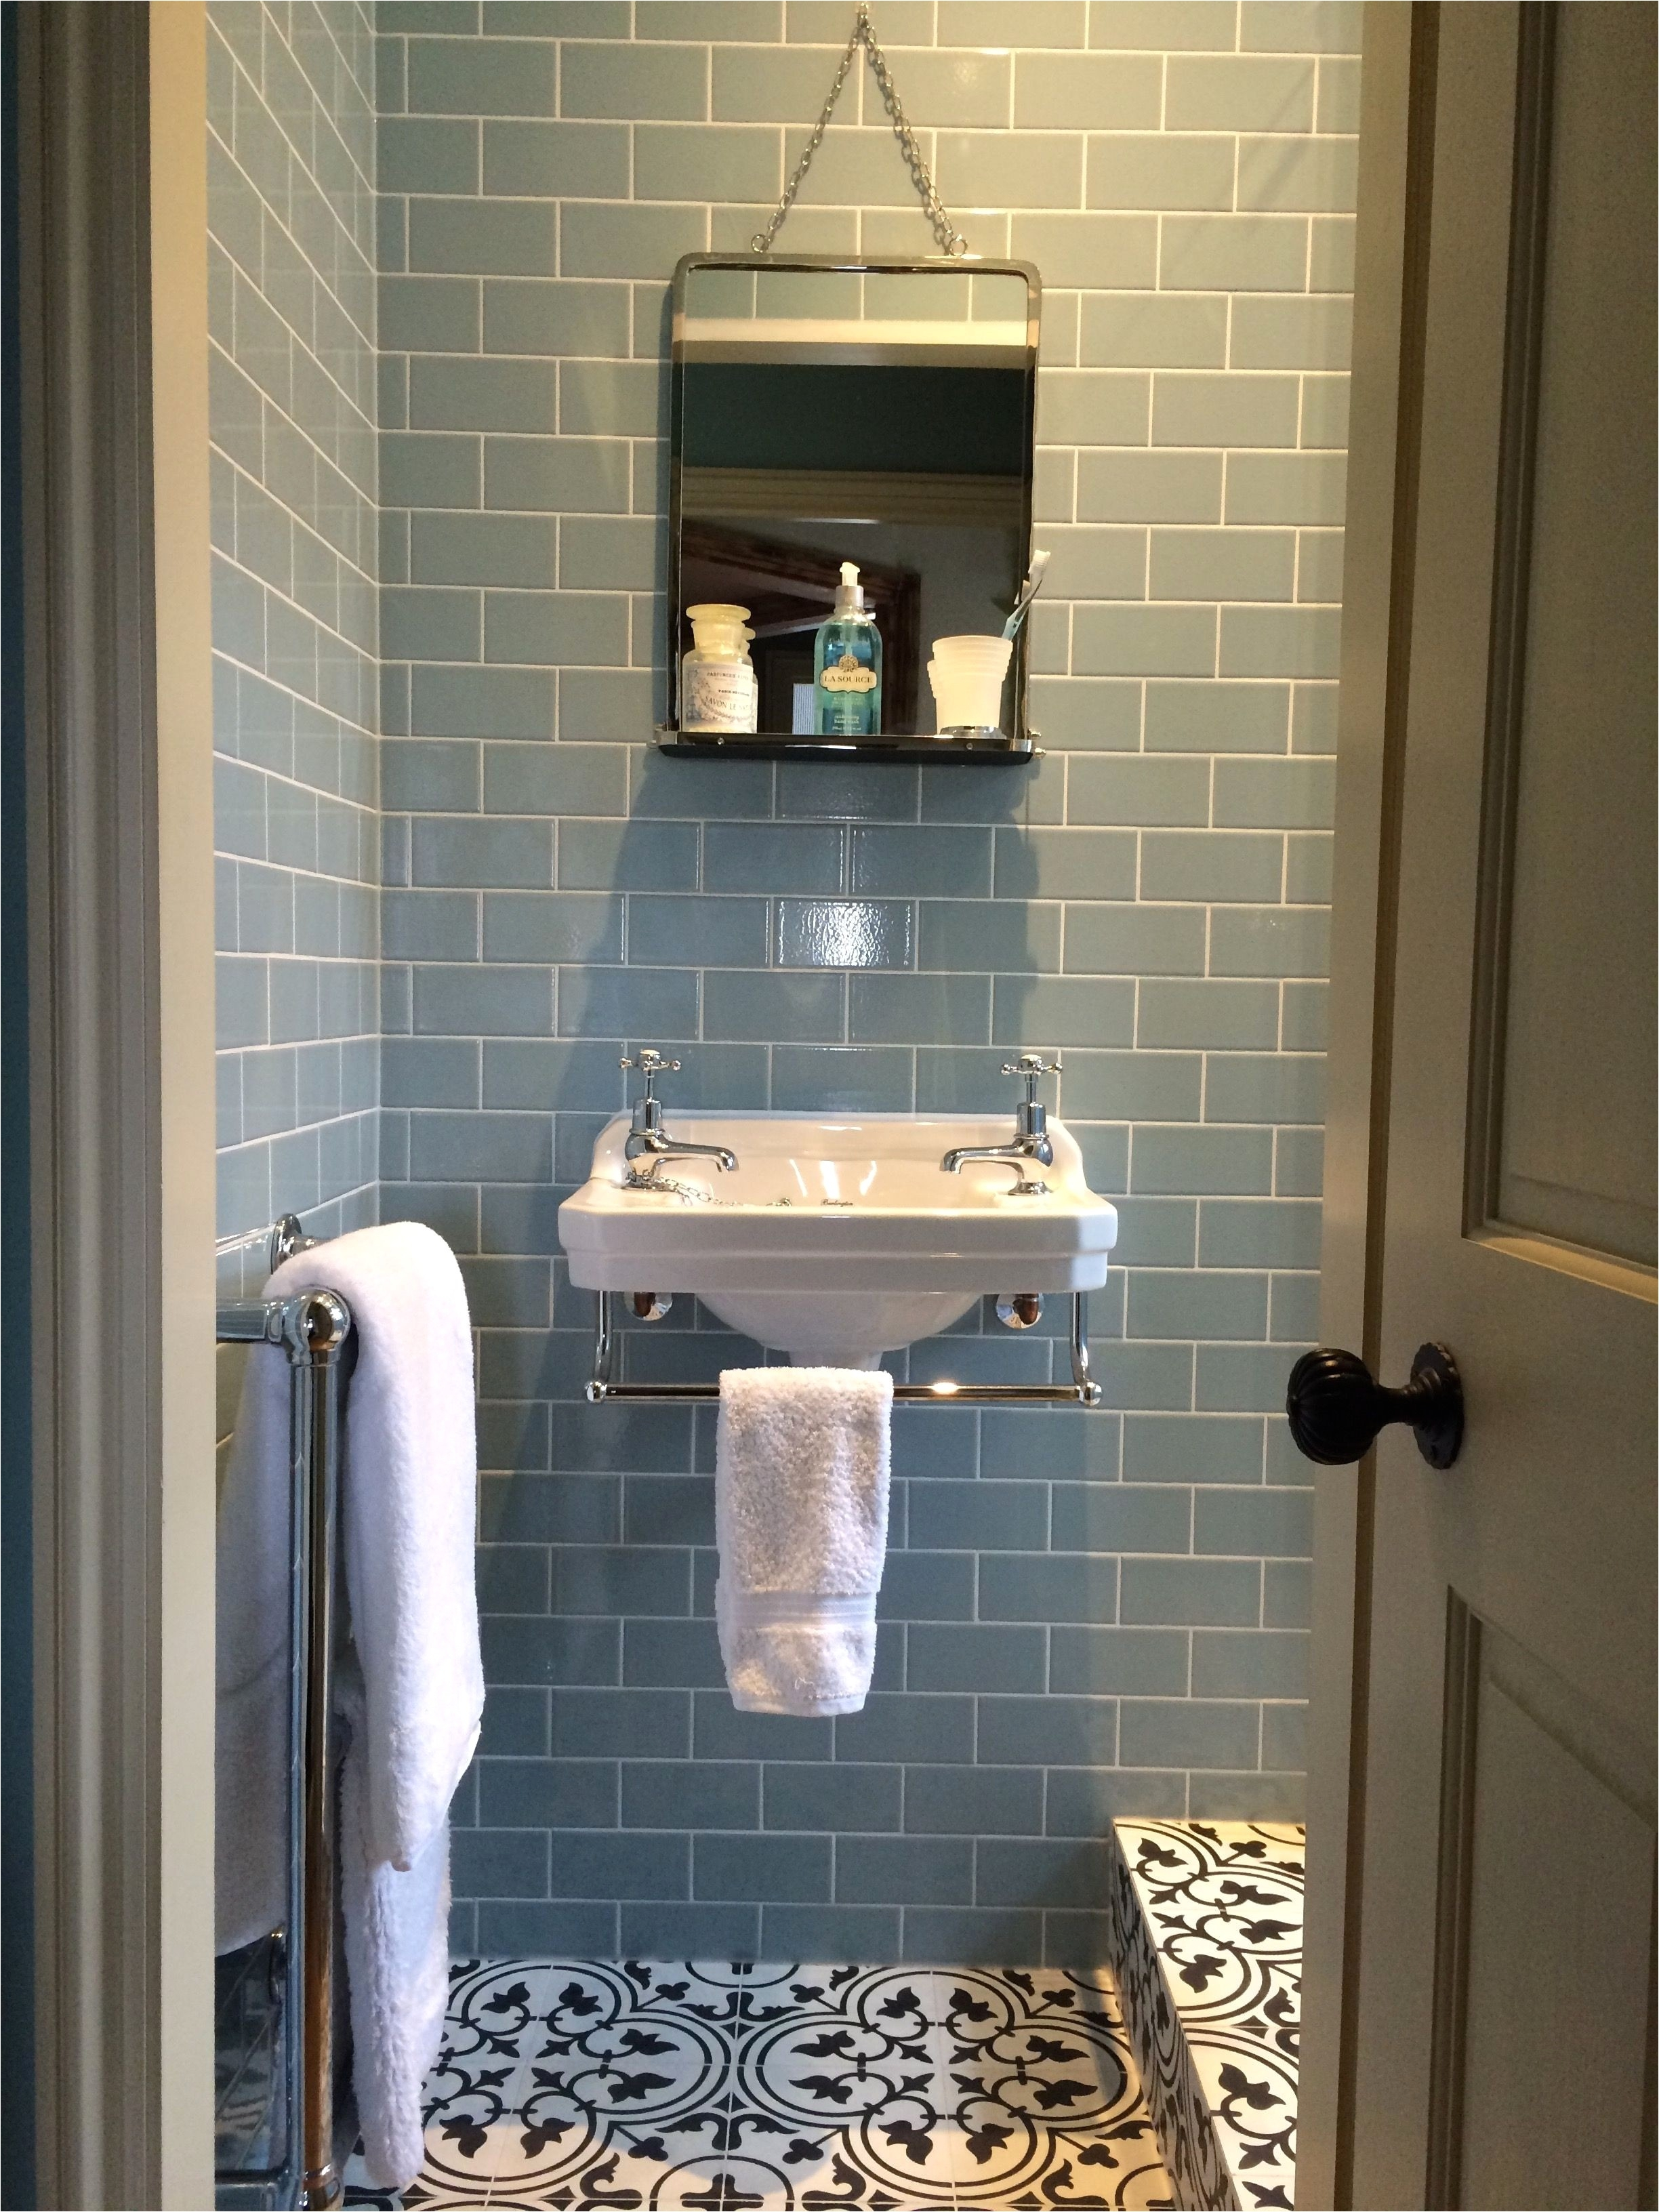 cool bathroom accessories ideas best bathtub faucet set h sink bathroom faucets repair i 0d cool